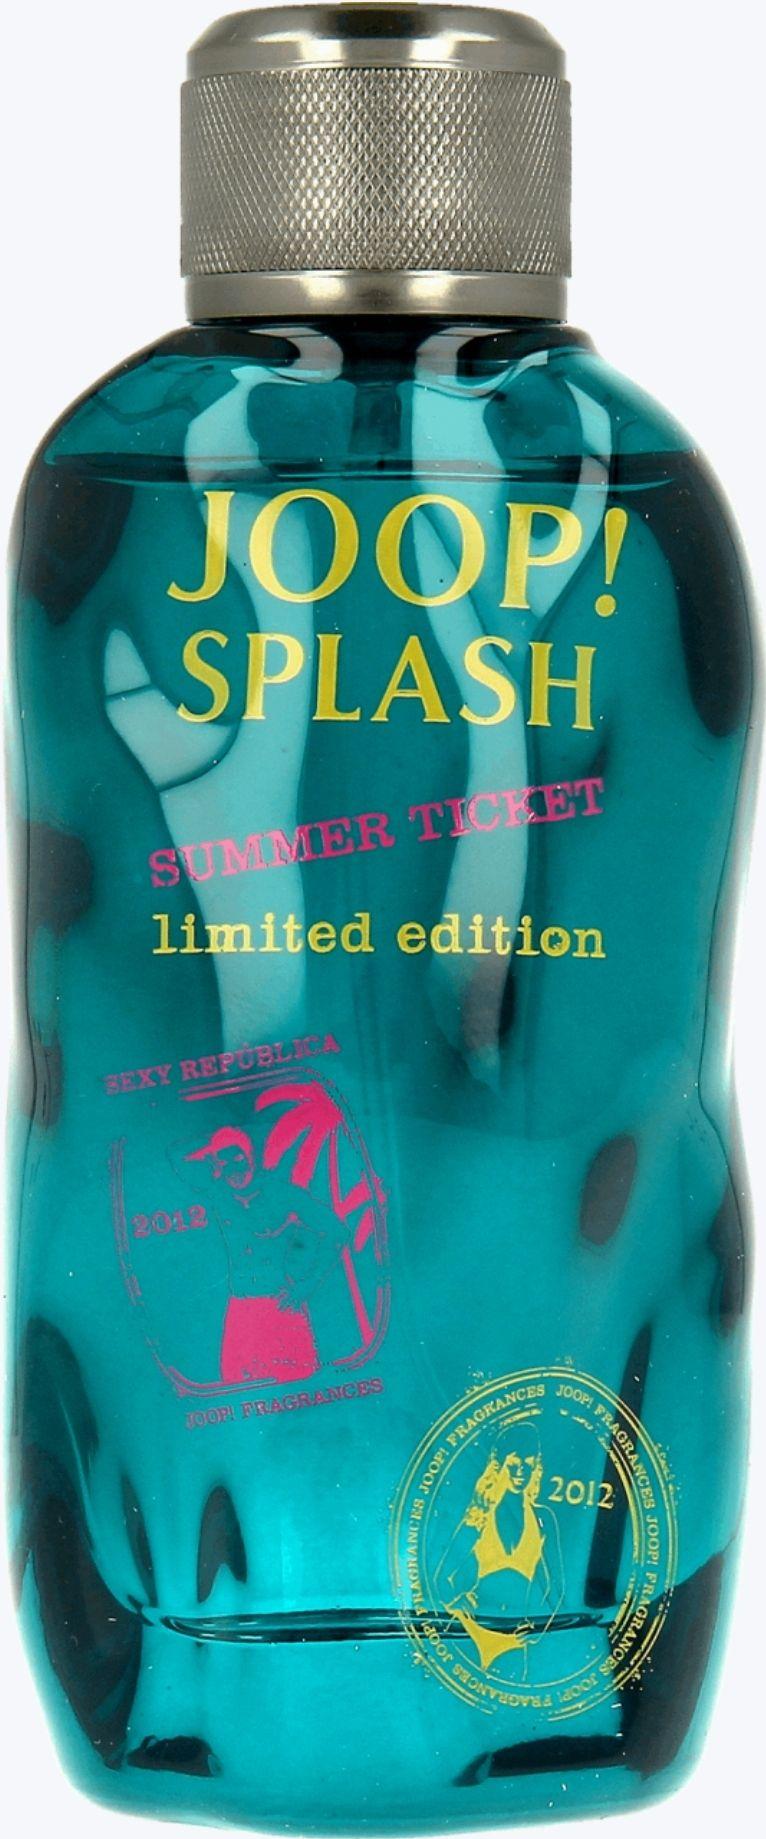 JOOP! Splash summer ticket man 115 ml